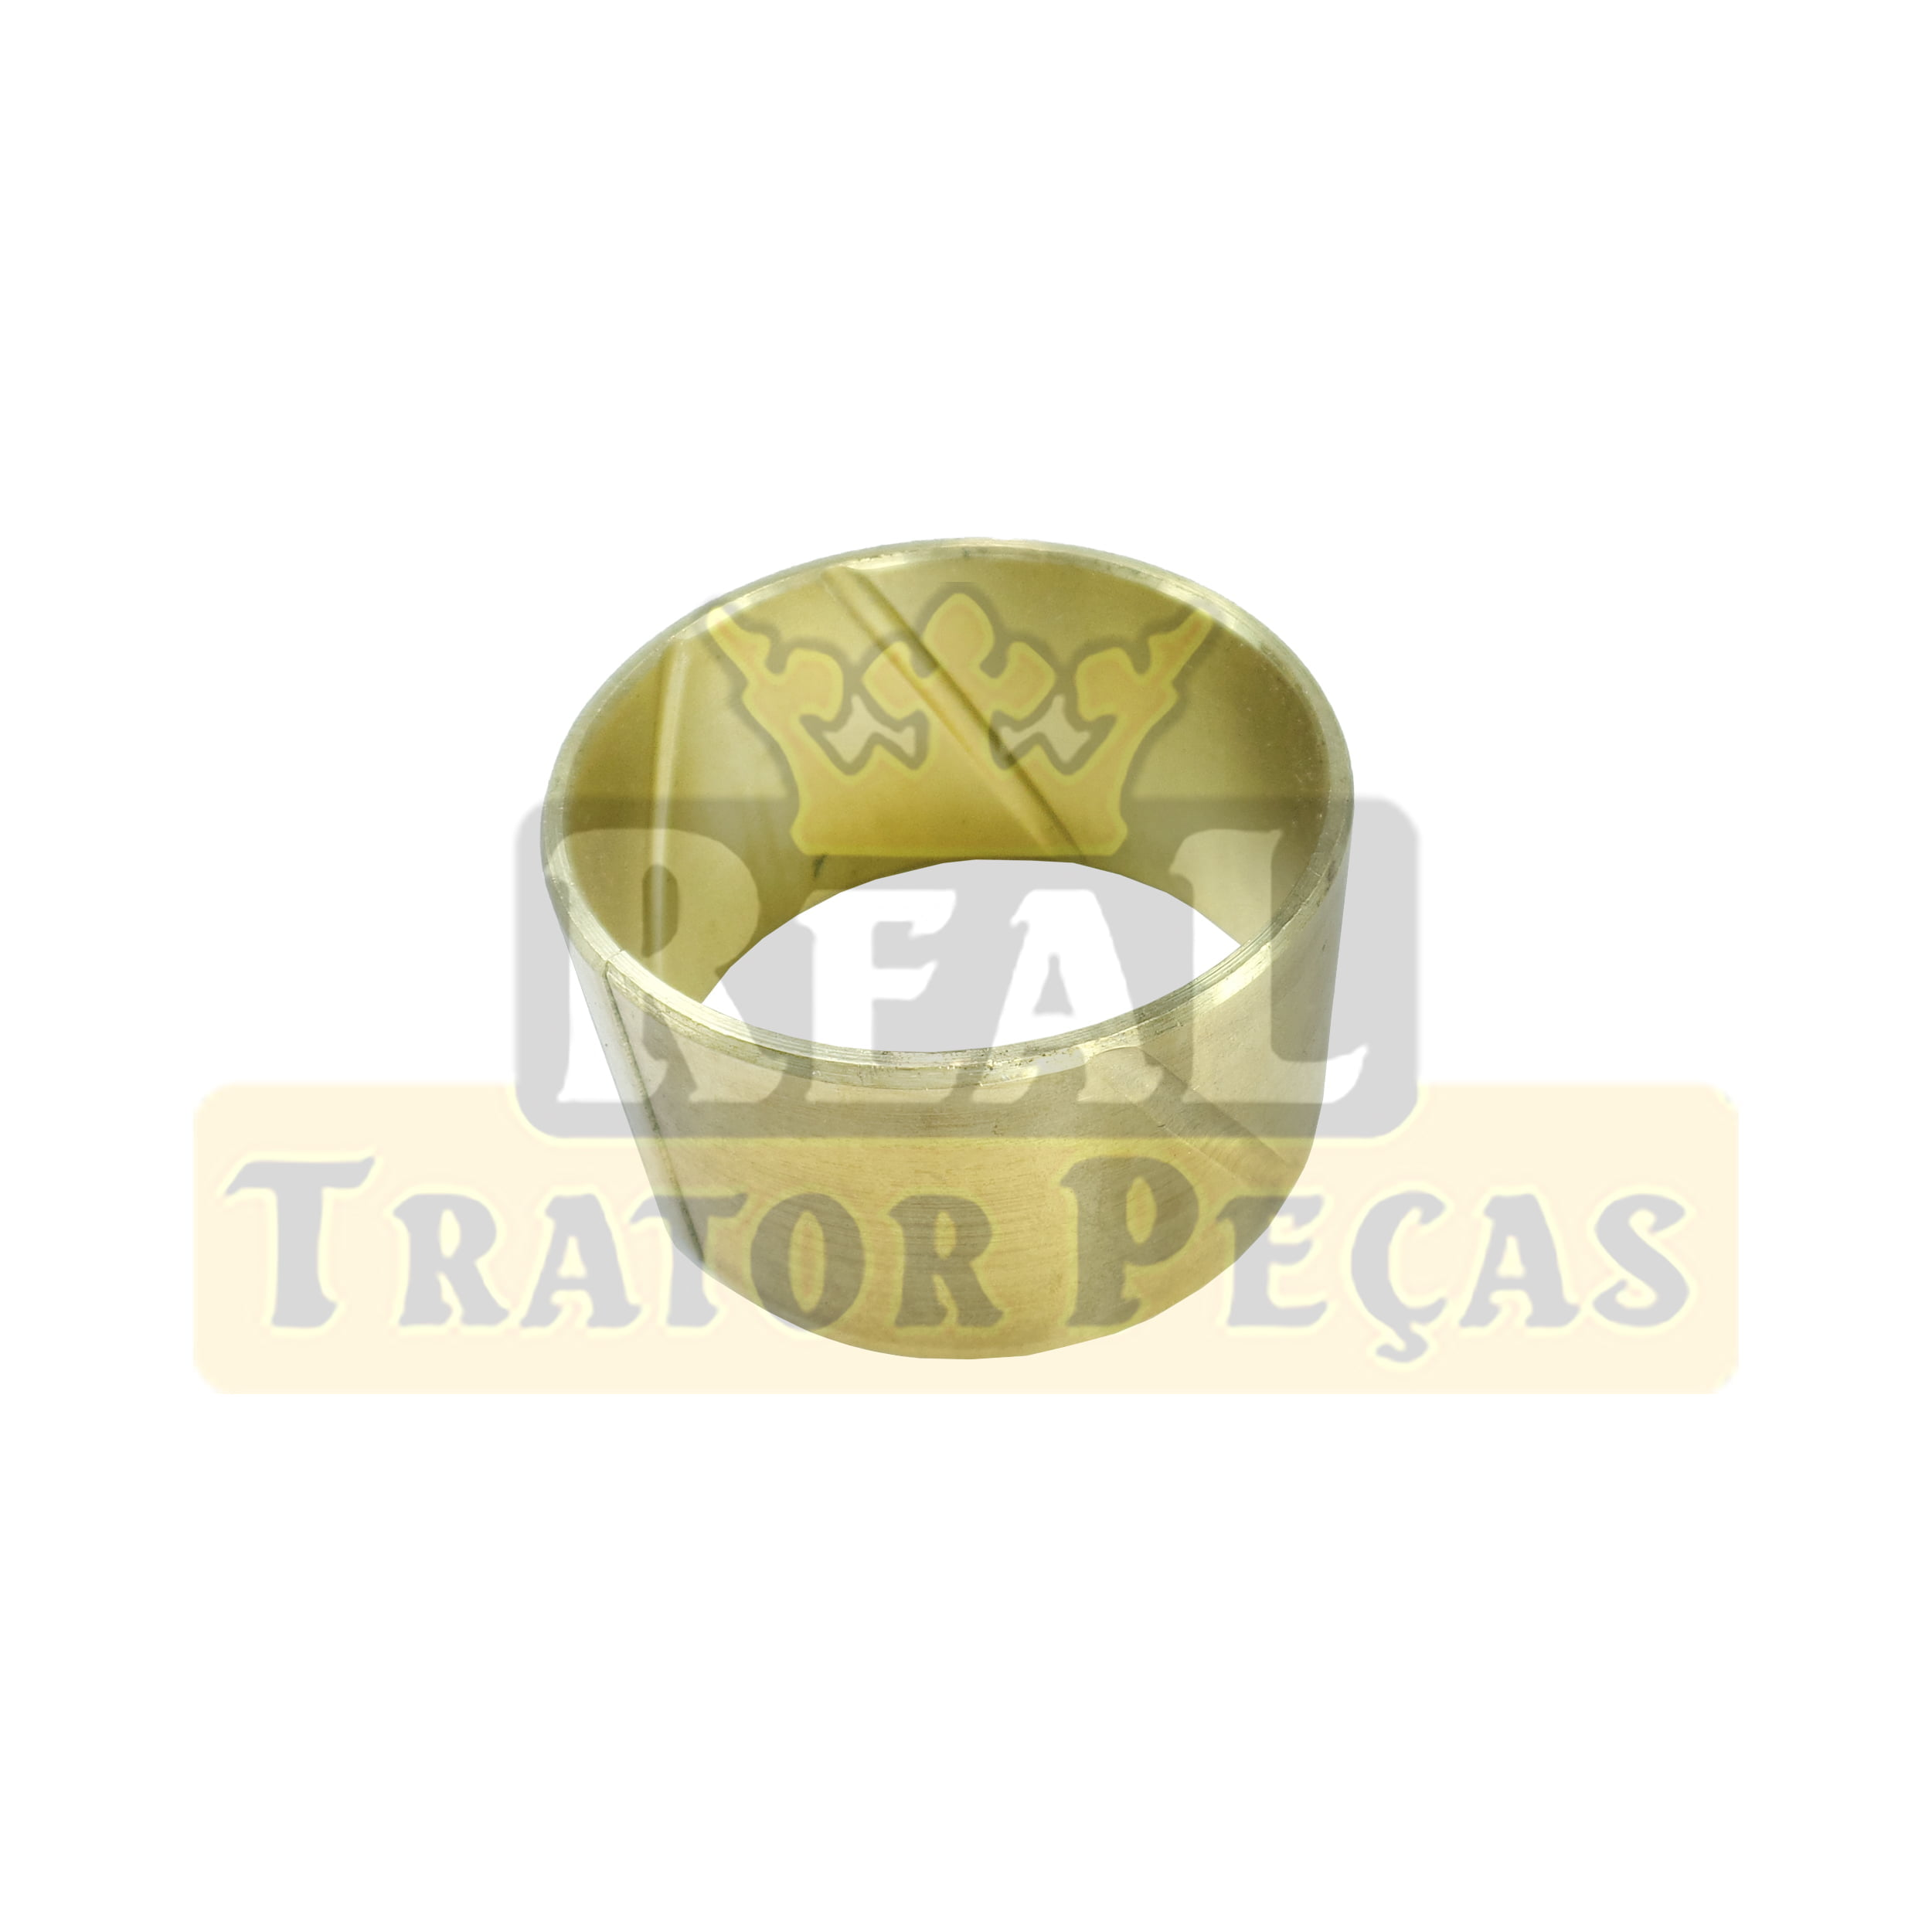 BUCHA - 46X50X25 - TRAÇÃO ZF 335 - MASSEY FERGUSON 250 / 265 / 275 / 281 / 283   5275 / 5285 / 5290   VALTRA 685 / 700 / 785 / 800 / 980 / BL   NEW HOLLAND 6610 / 7610